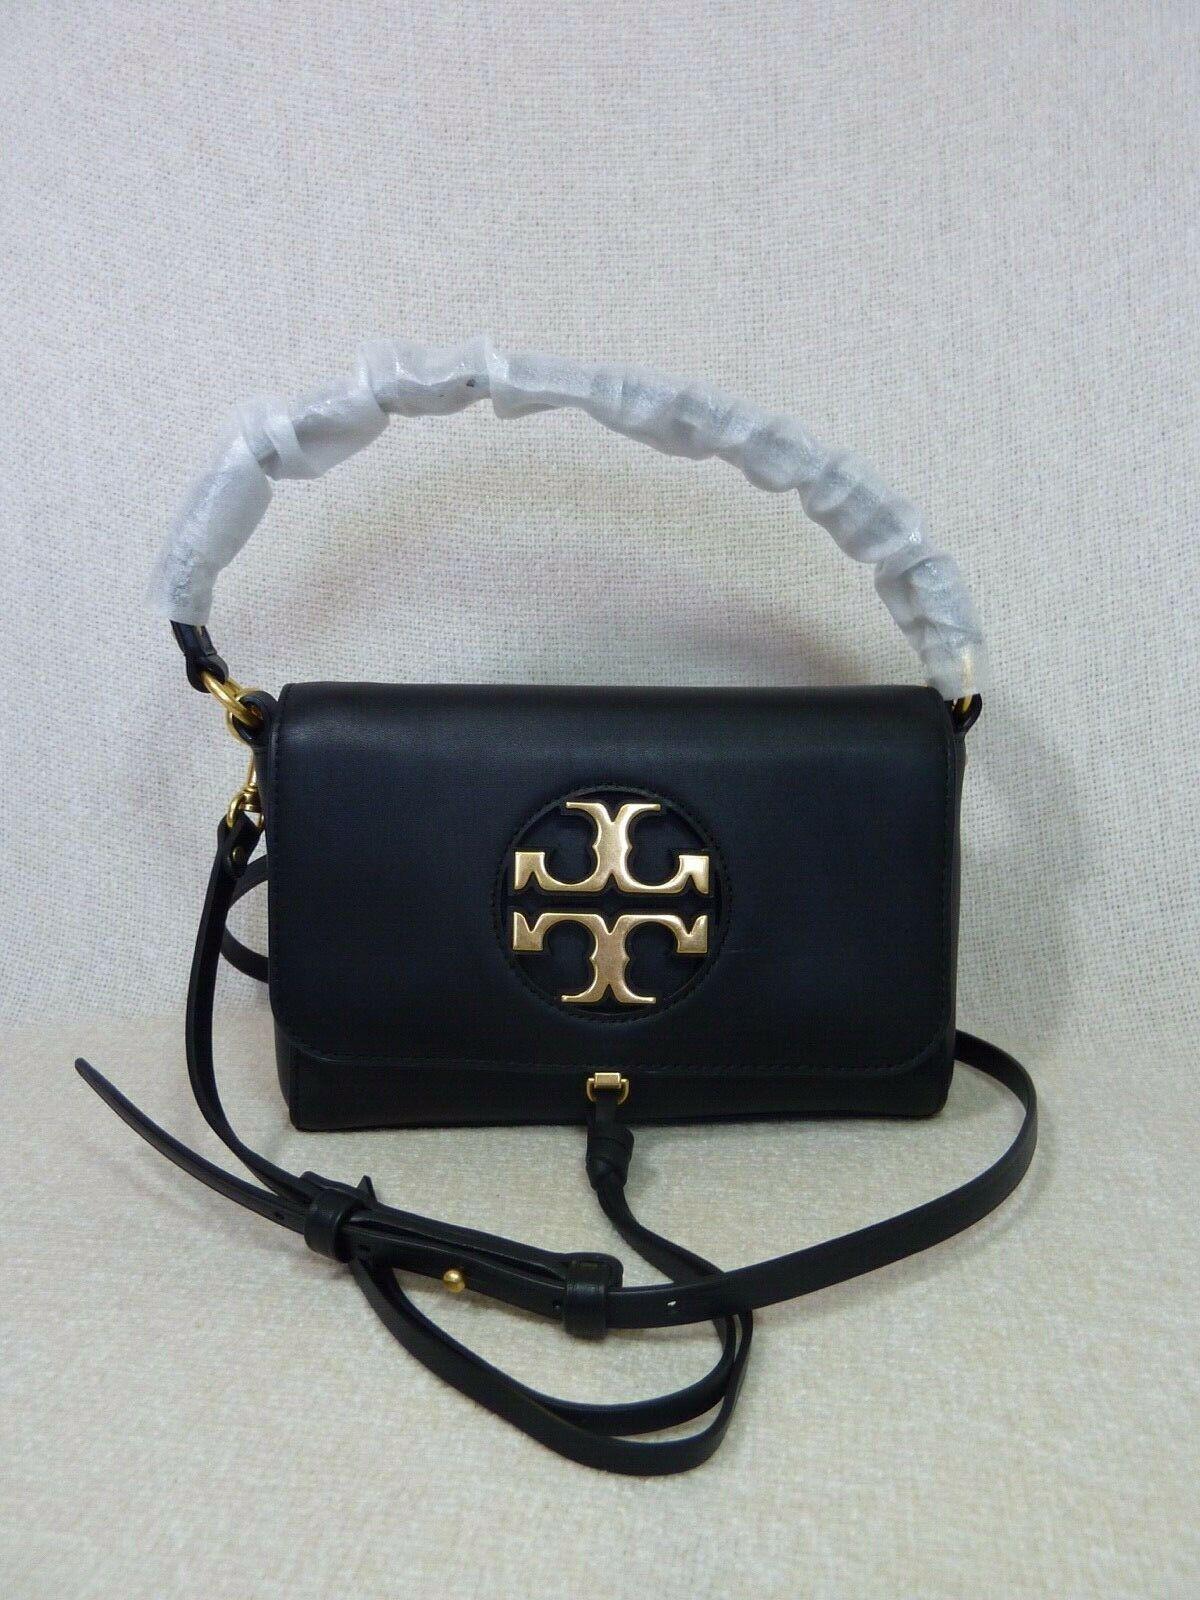 NWT Tory Burch Black Leather Miller Metal Cross-Body Bag/Mini Shoulder Bag $398 image 3